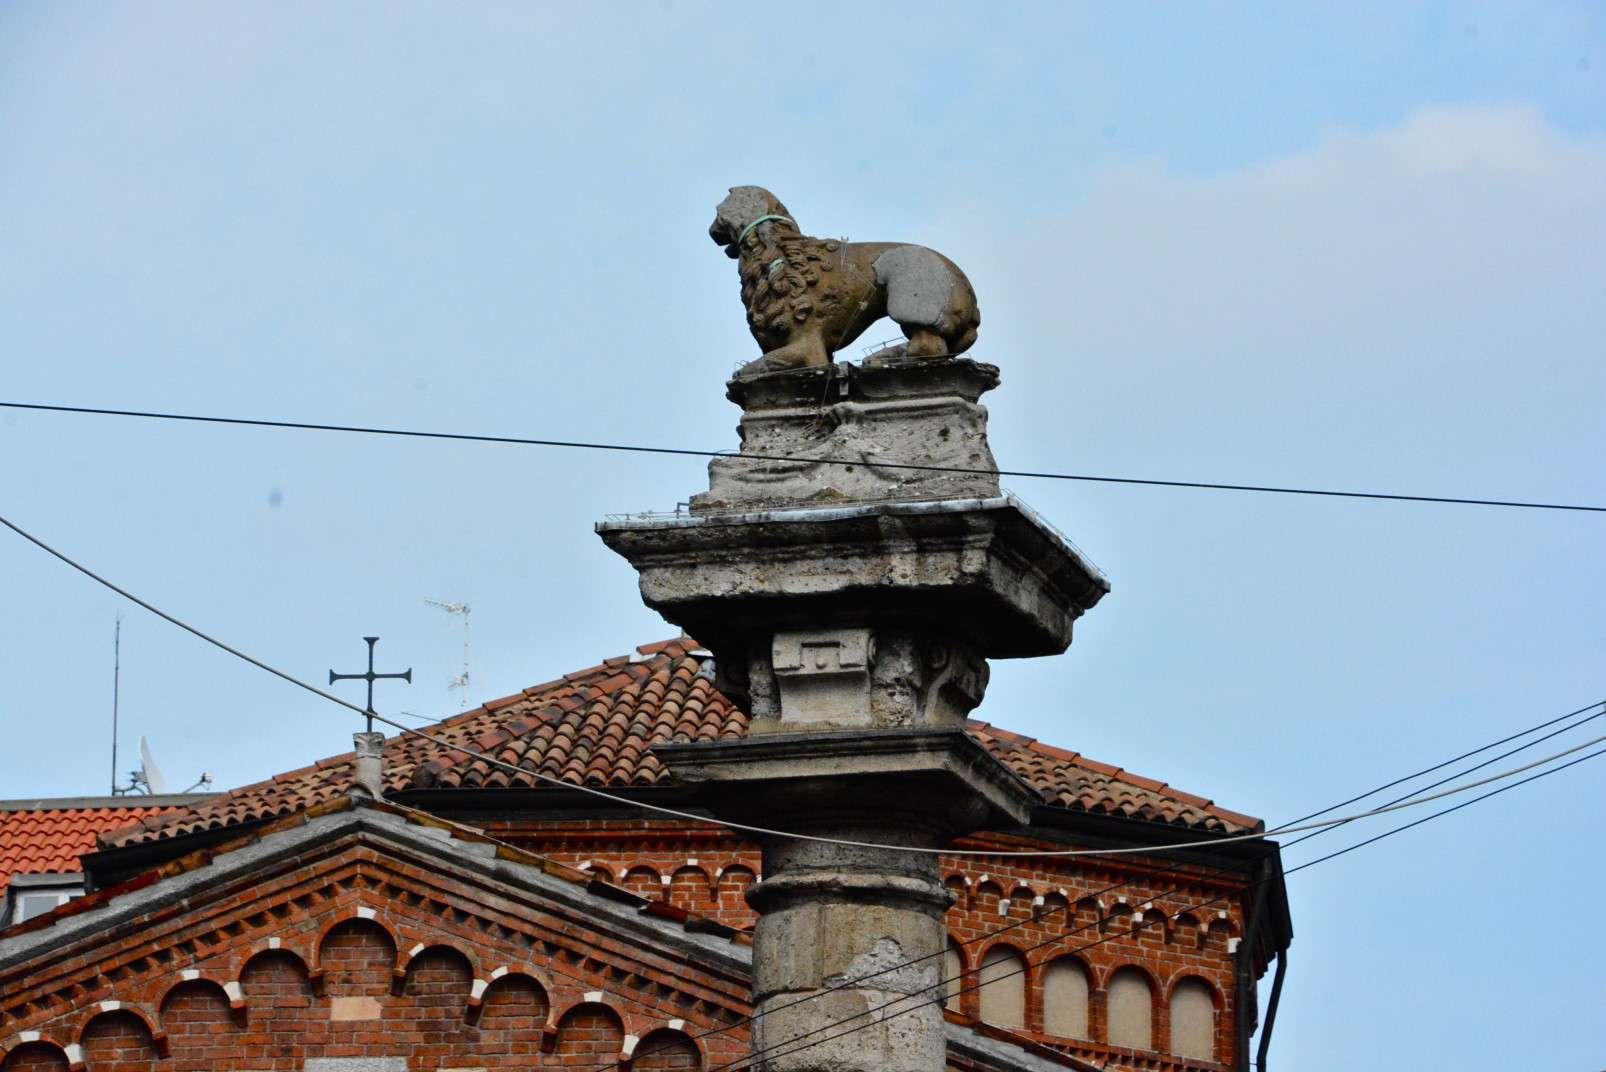 The Lion in Piazza San Babila, Milan